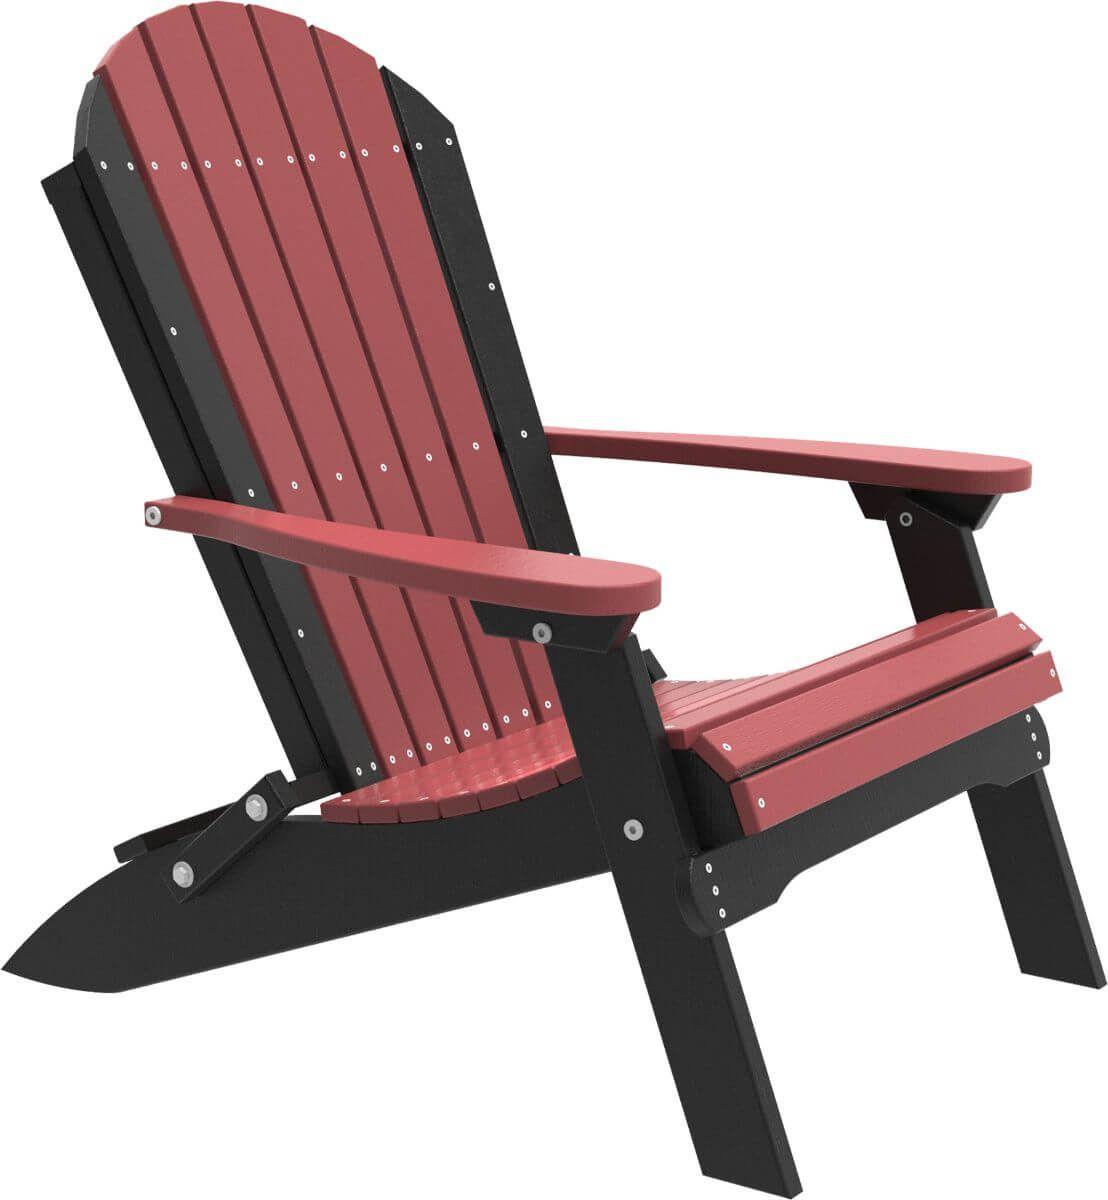 Cherrywood and Black Tahiti Folding Adirondack Chair